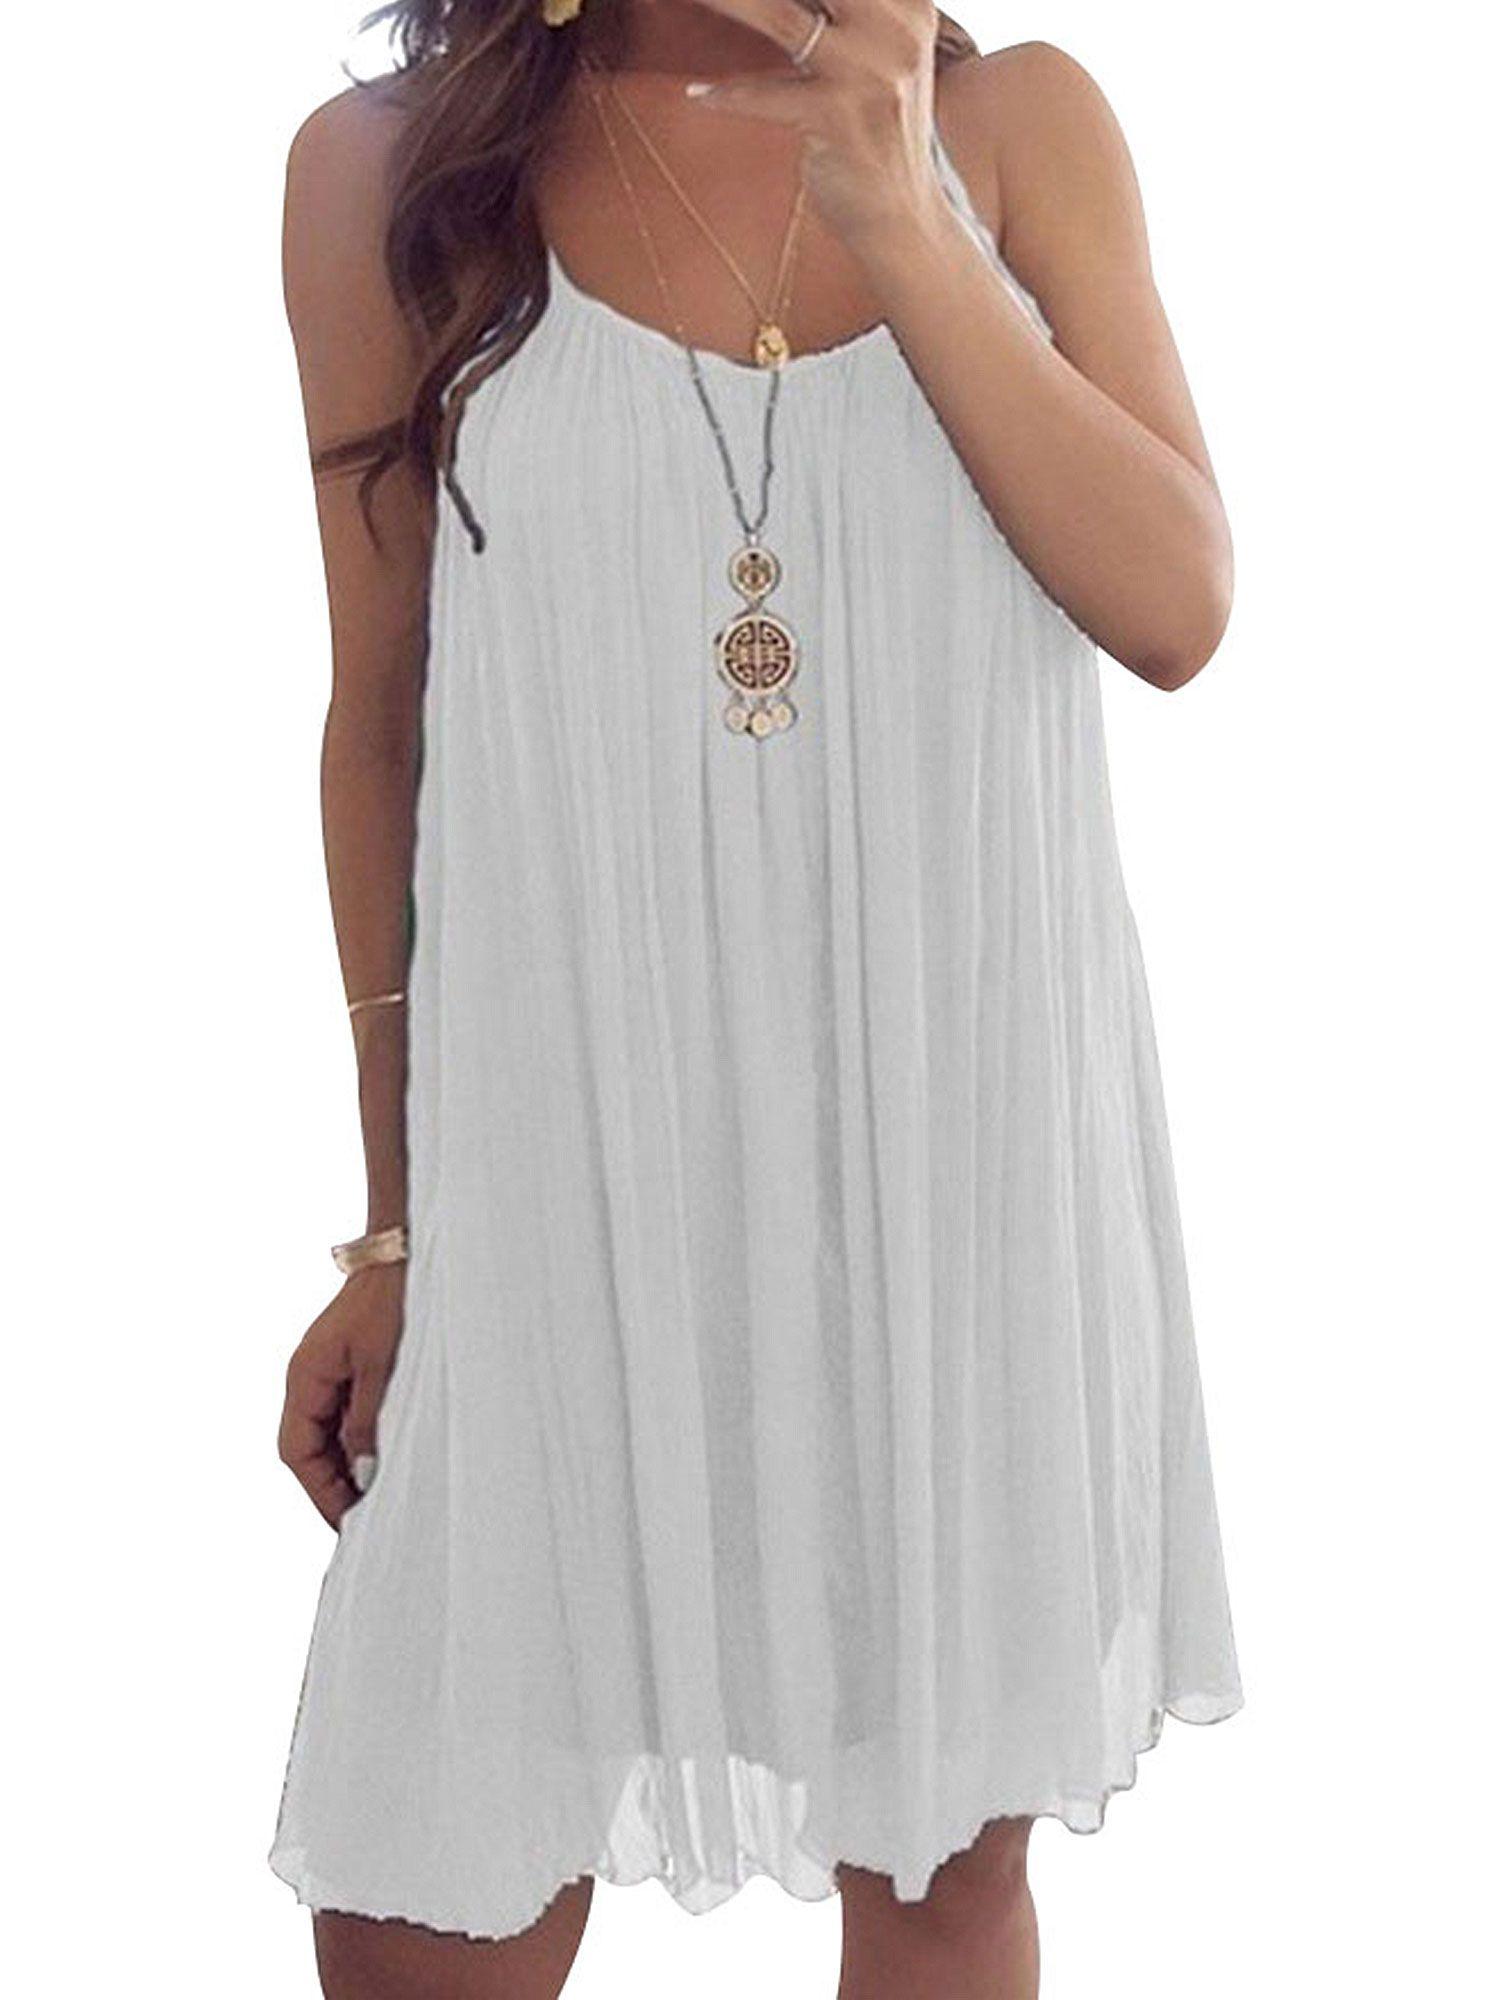 Summer Spaghetti Strap Chiffon Sundress For Women Plus Size Sleeveless Beach Slip Dress Top Shirt Dres Short Mini Dress Summer Dresses For Women Womens Dresses [ 2000 x 1500 Pixel ]